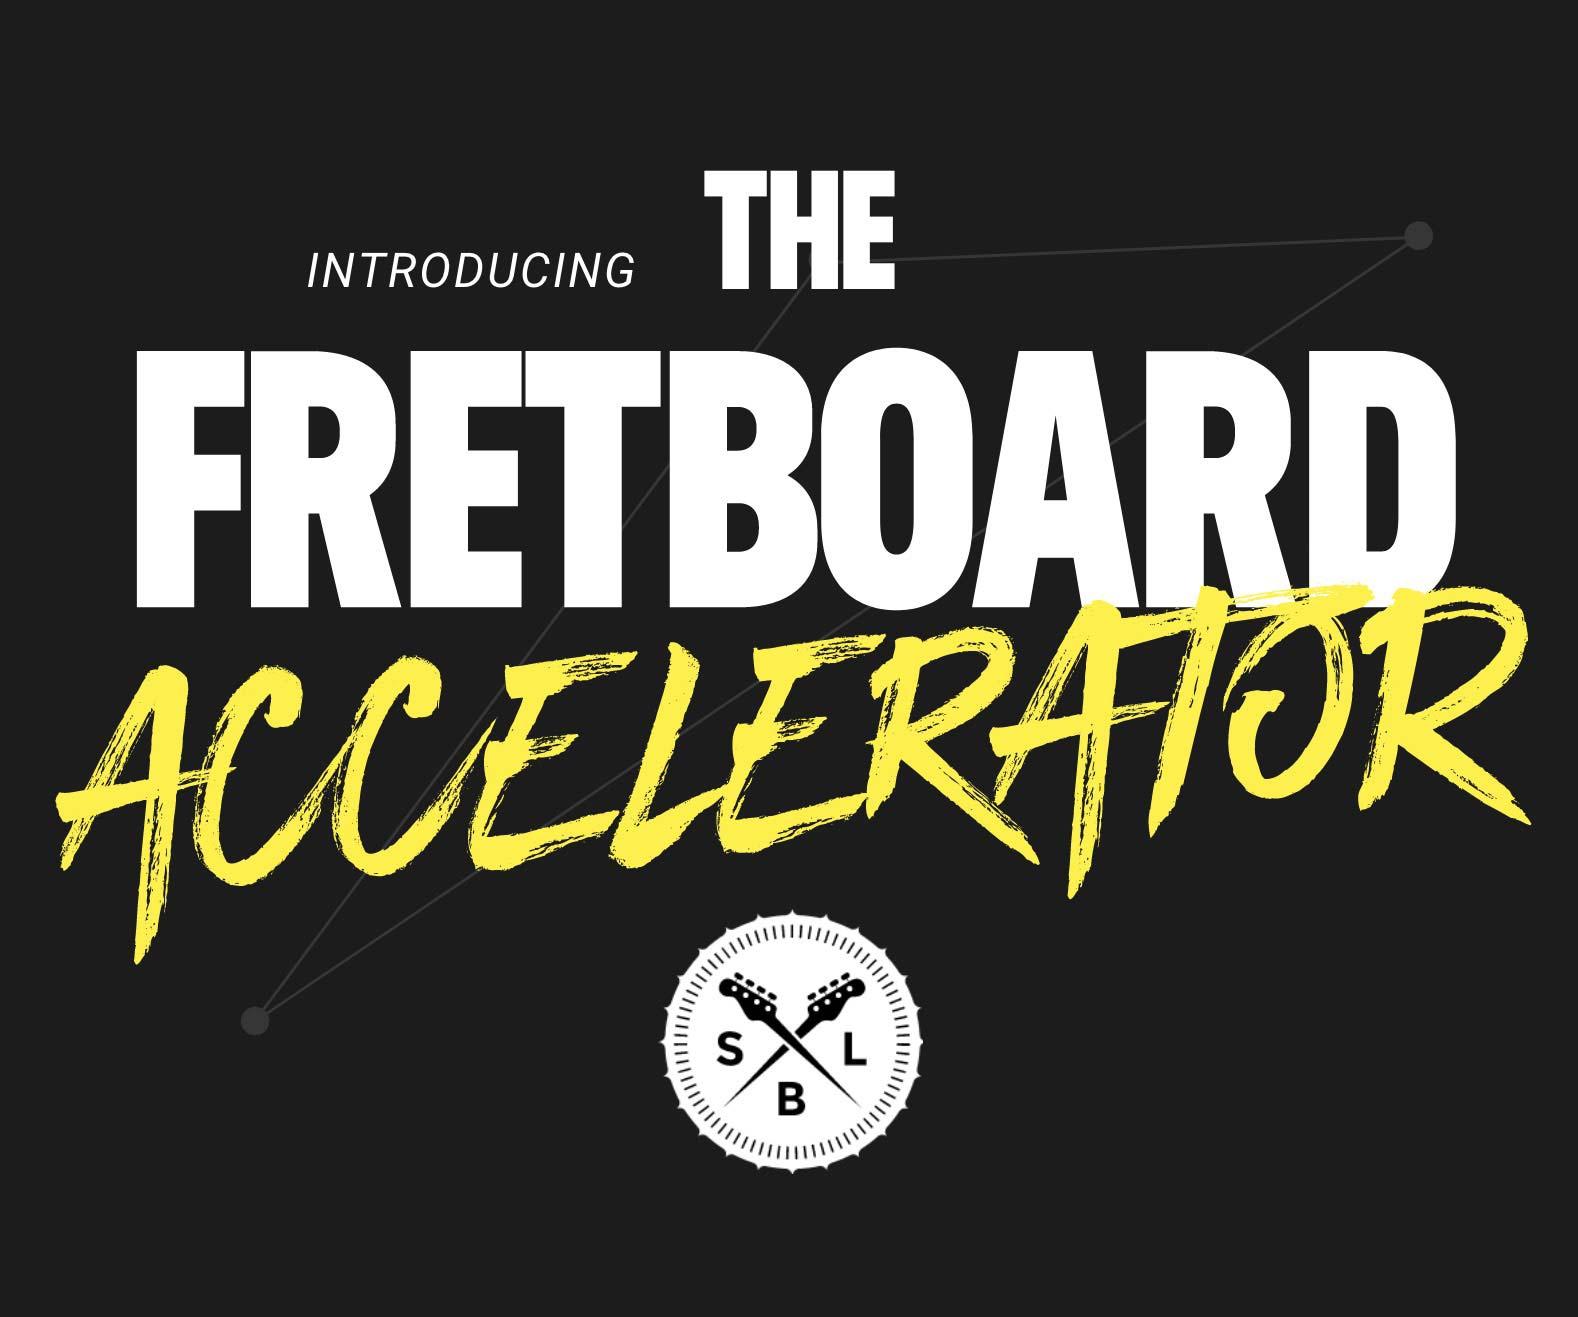 Fretboard Accelerator